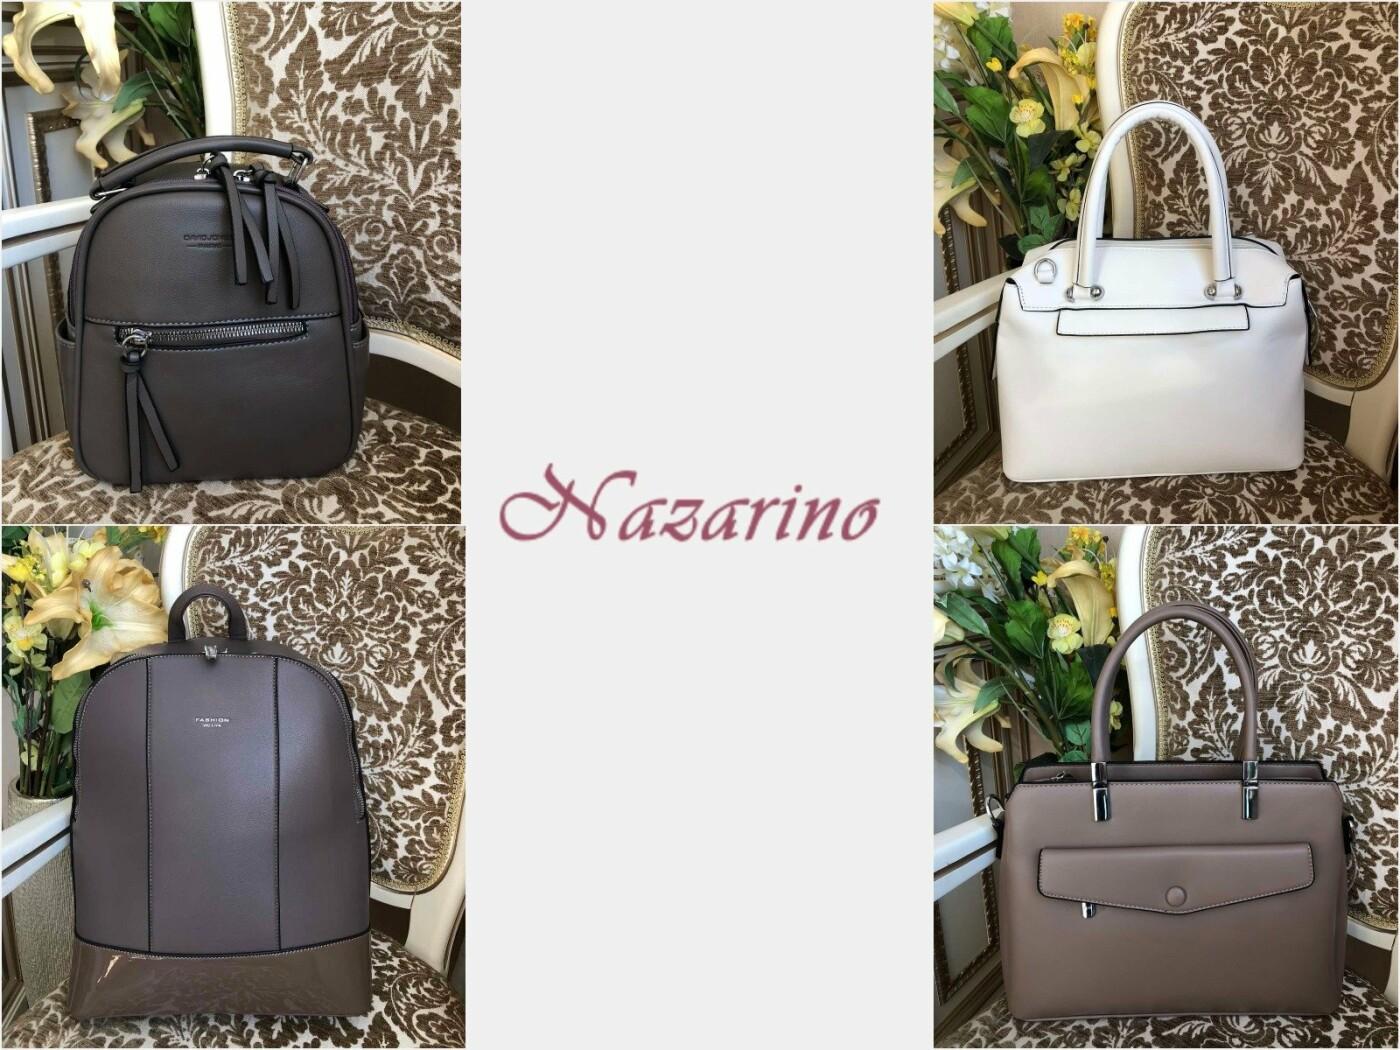 Женские сумочки от интернет-магазина Nazarino, фото-1